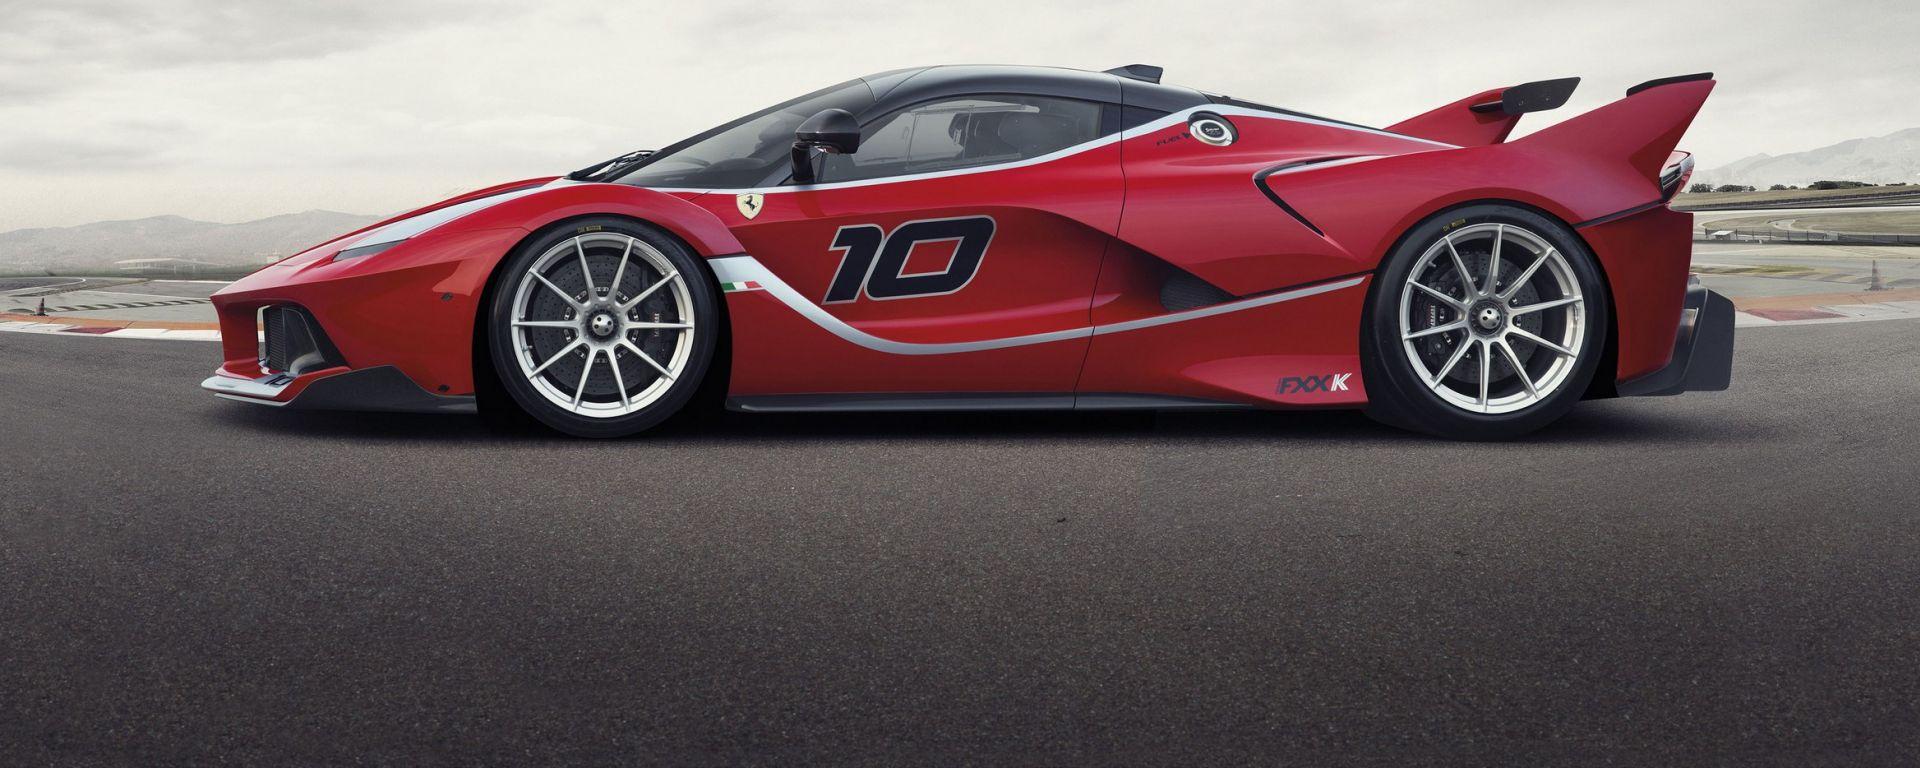 Ferrari FXX K: Maranello pensa già all'Evoluzione